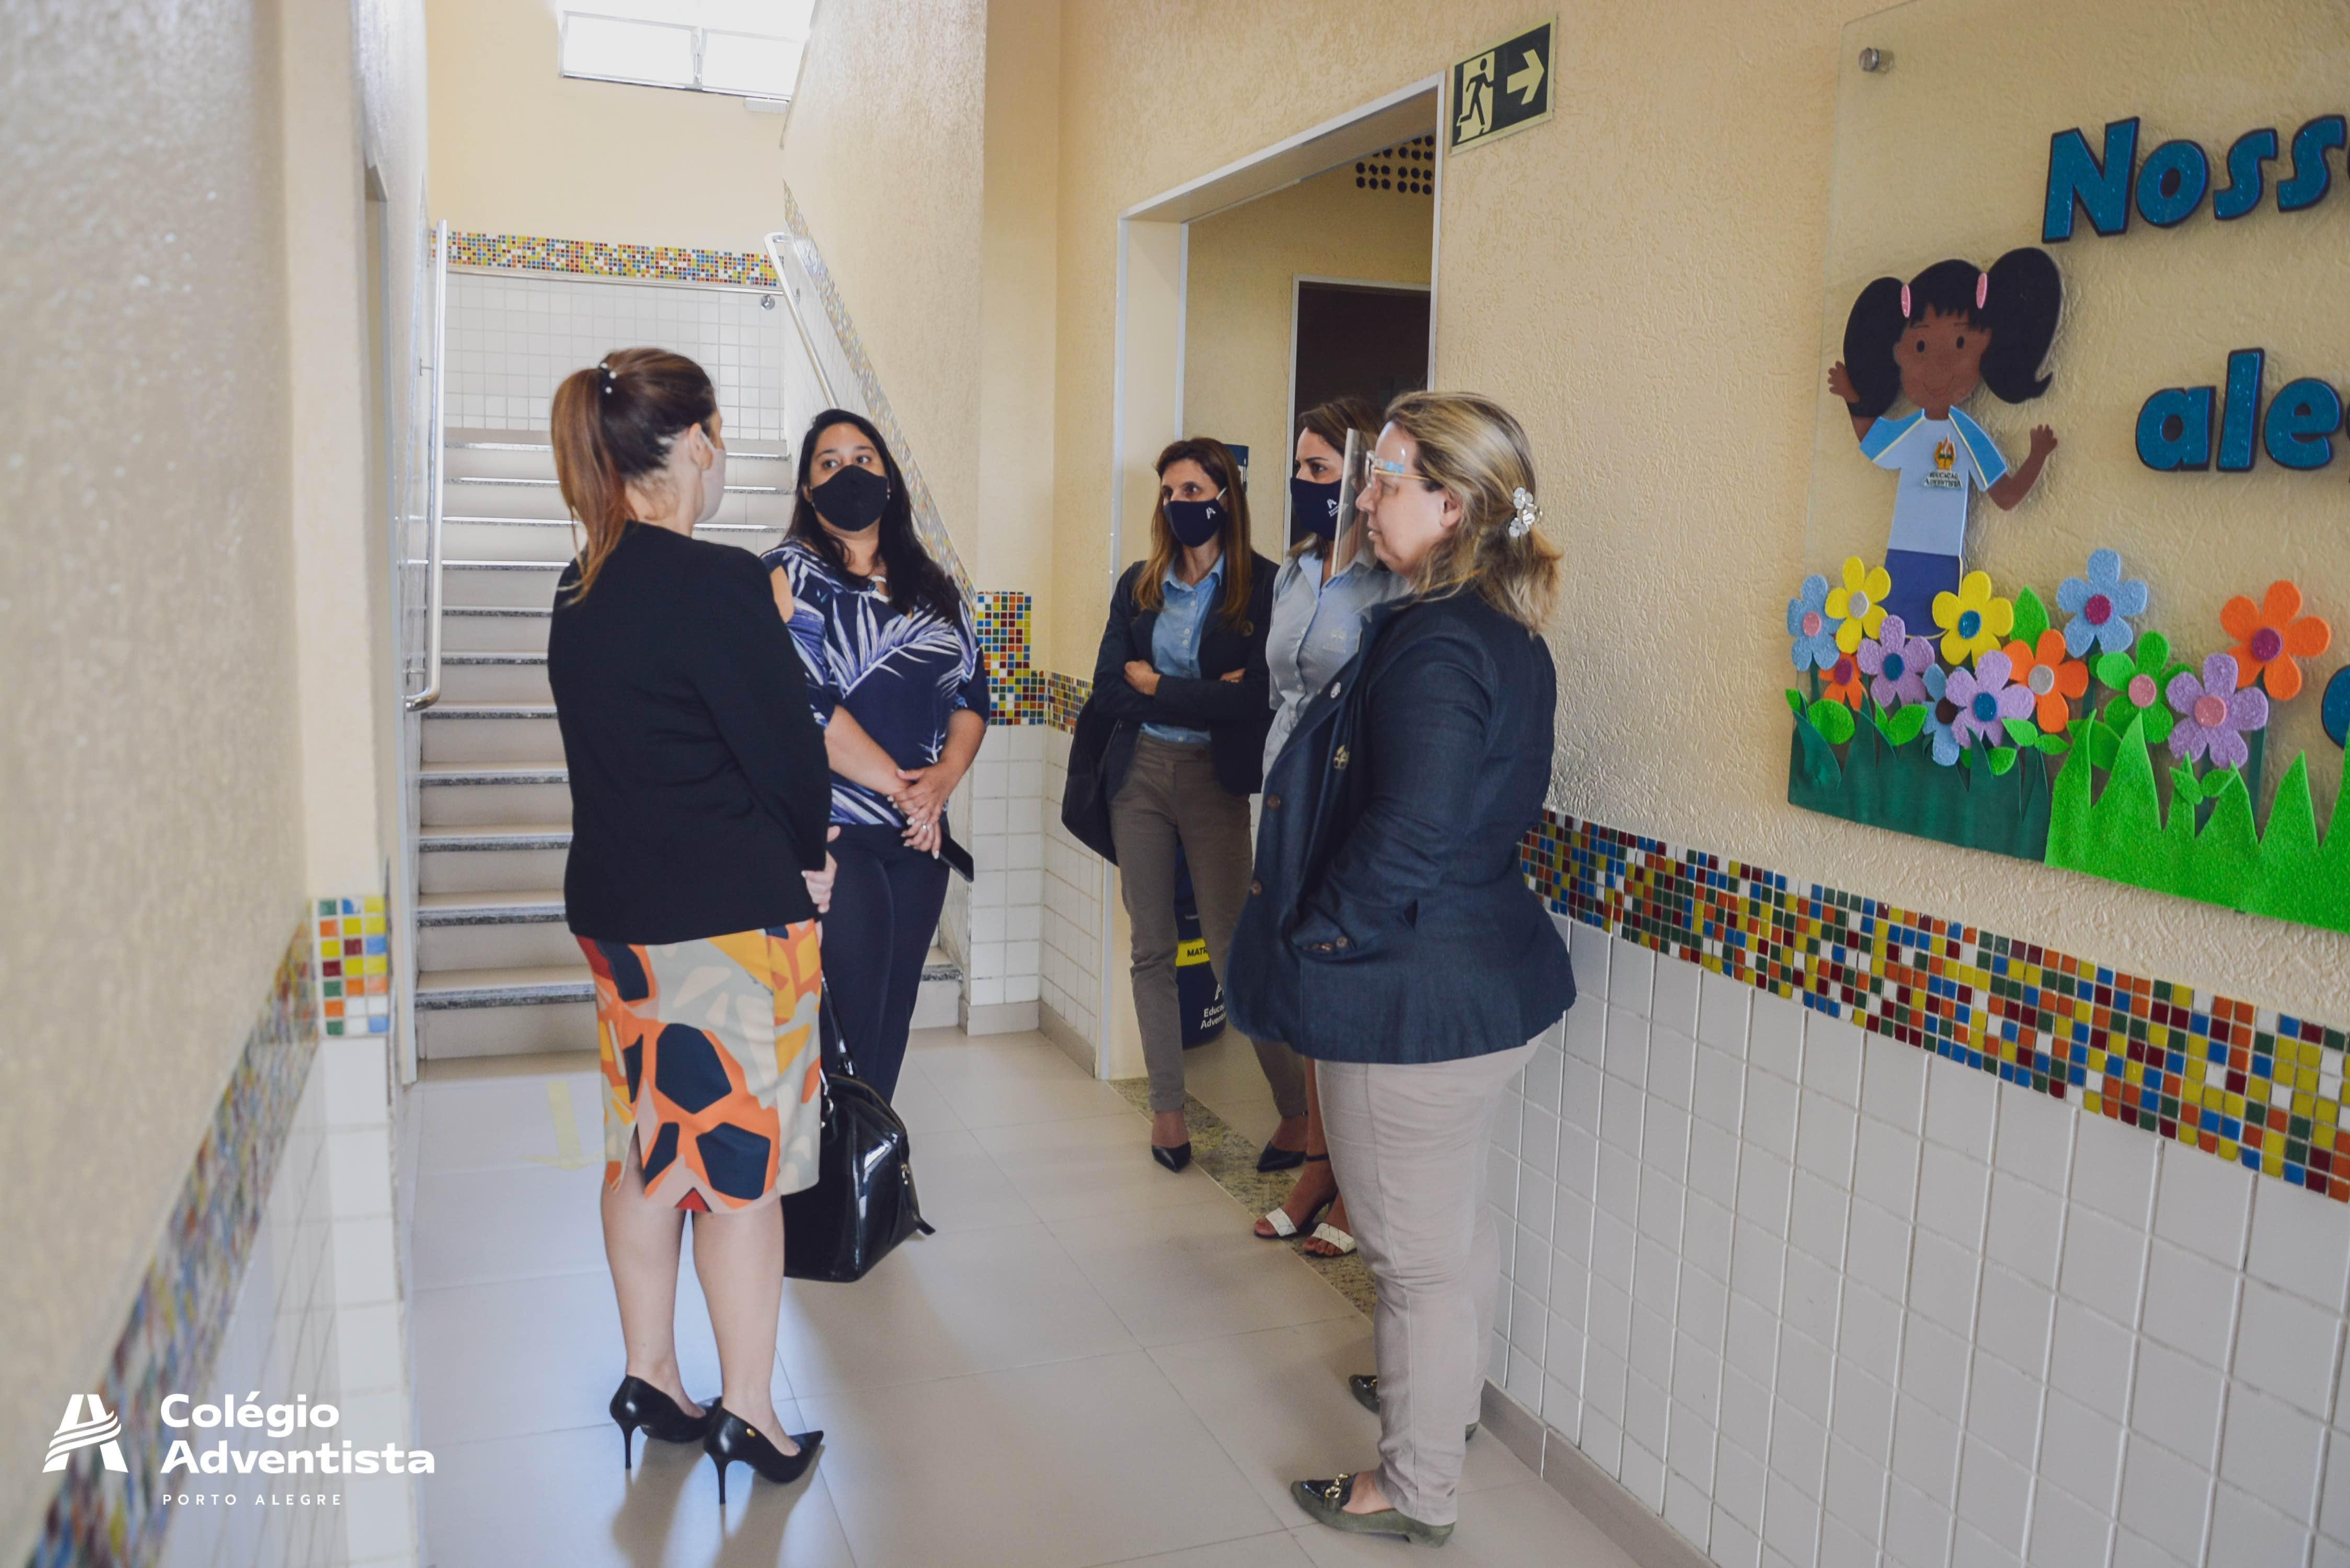 Promotoria de Osório visita Colégio Adventista Porto Alegre.